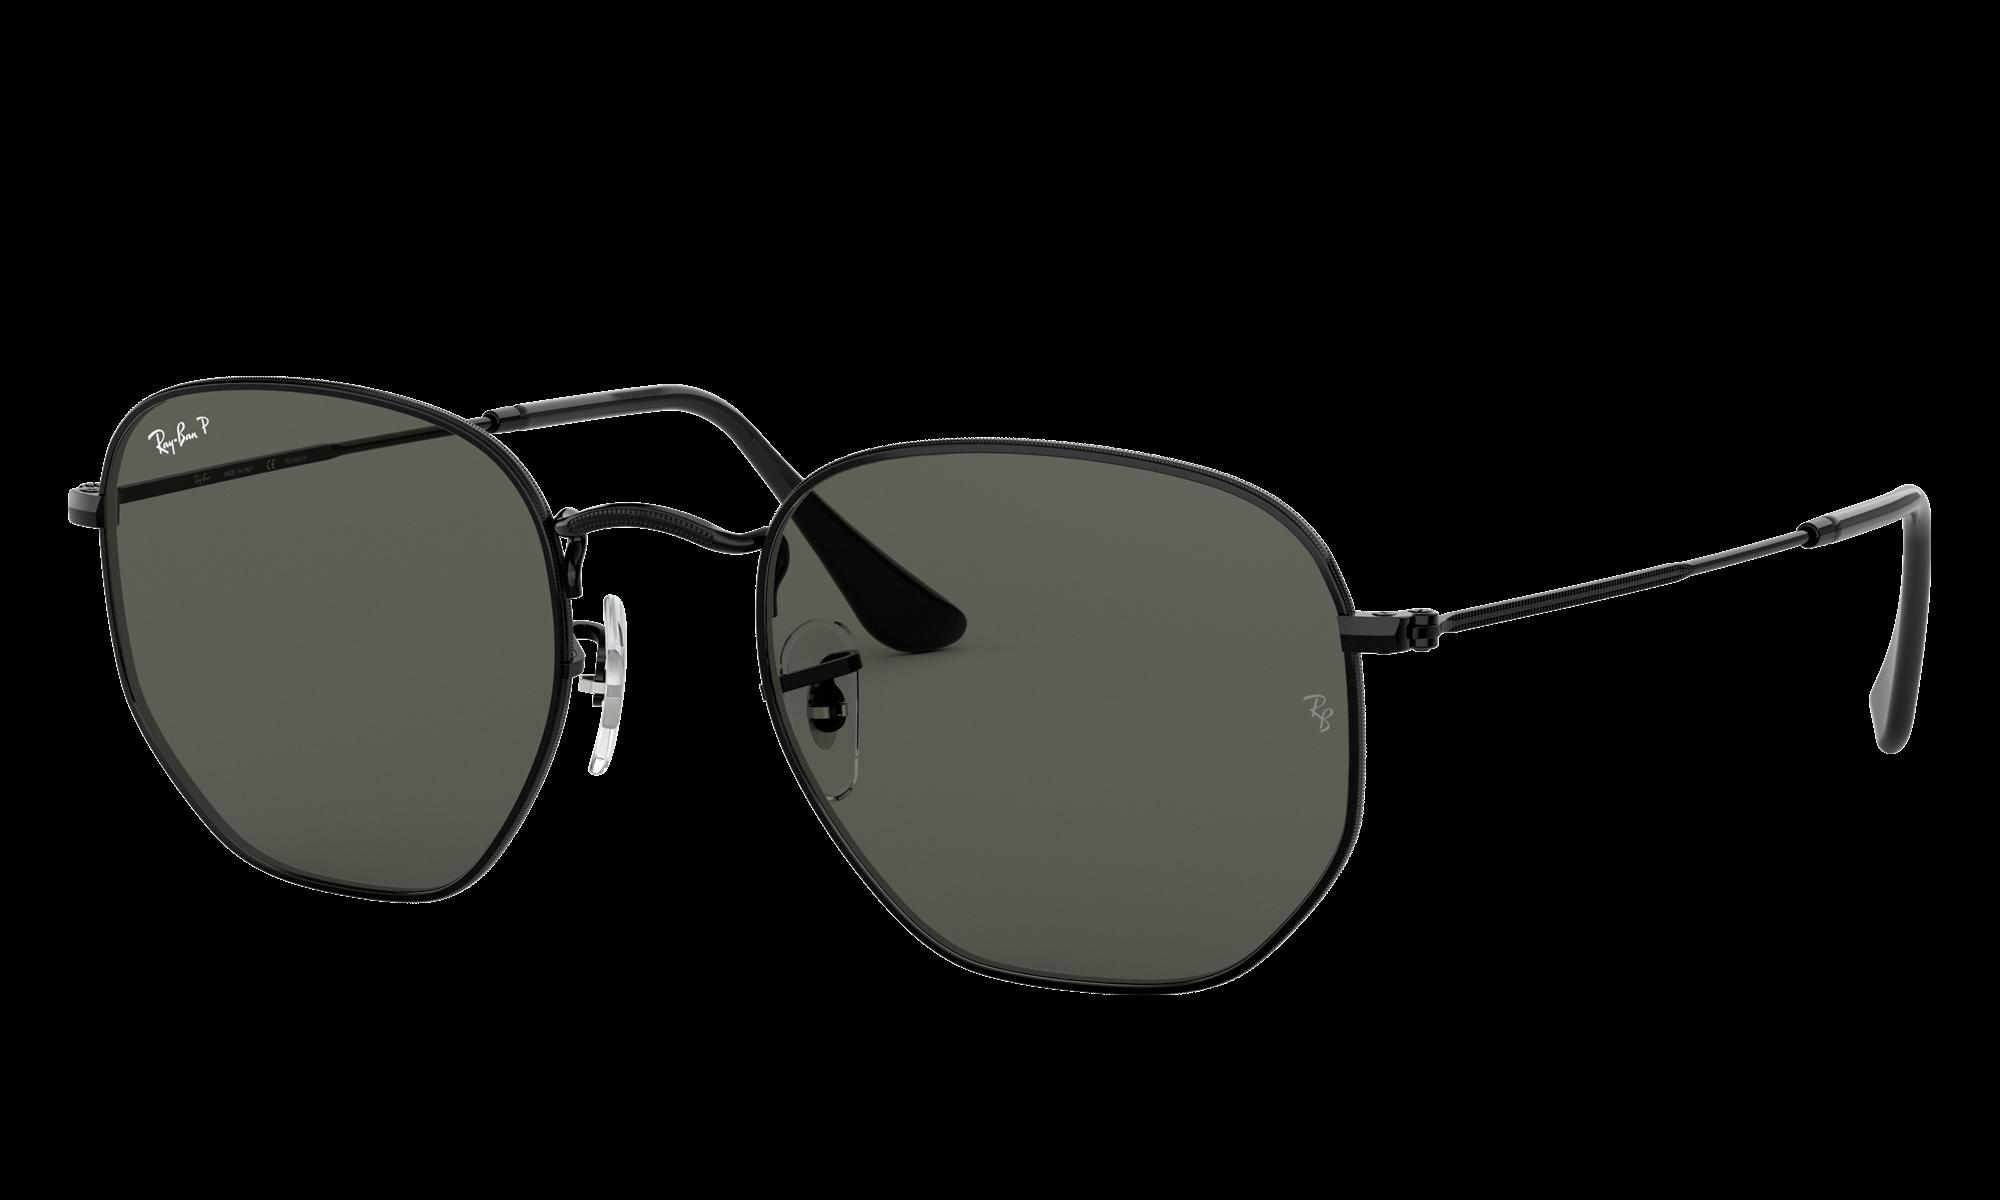 1940s Men's Clothing Ray-Ban Unisex Hexagonal Flat Lenses Black Size Standard $204.00 AT vintagedancer.com